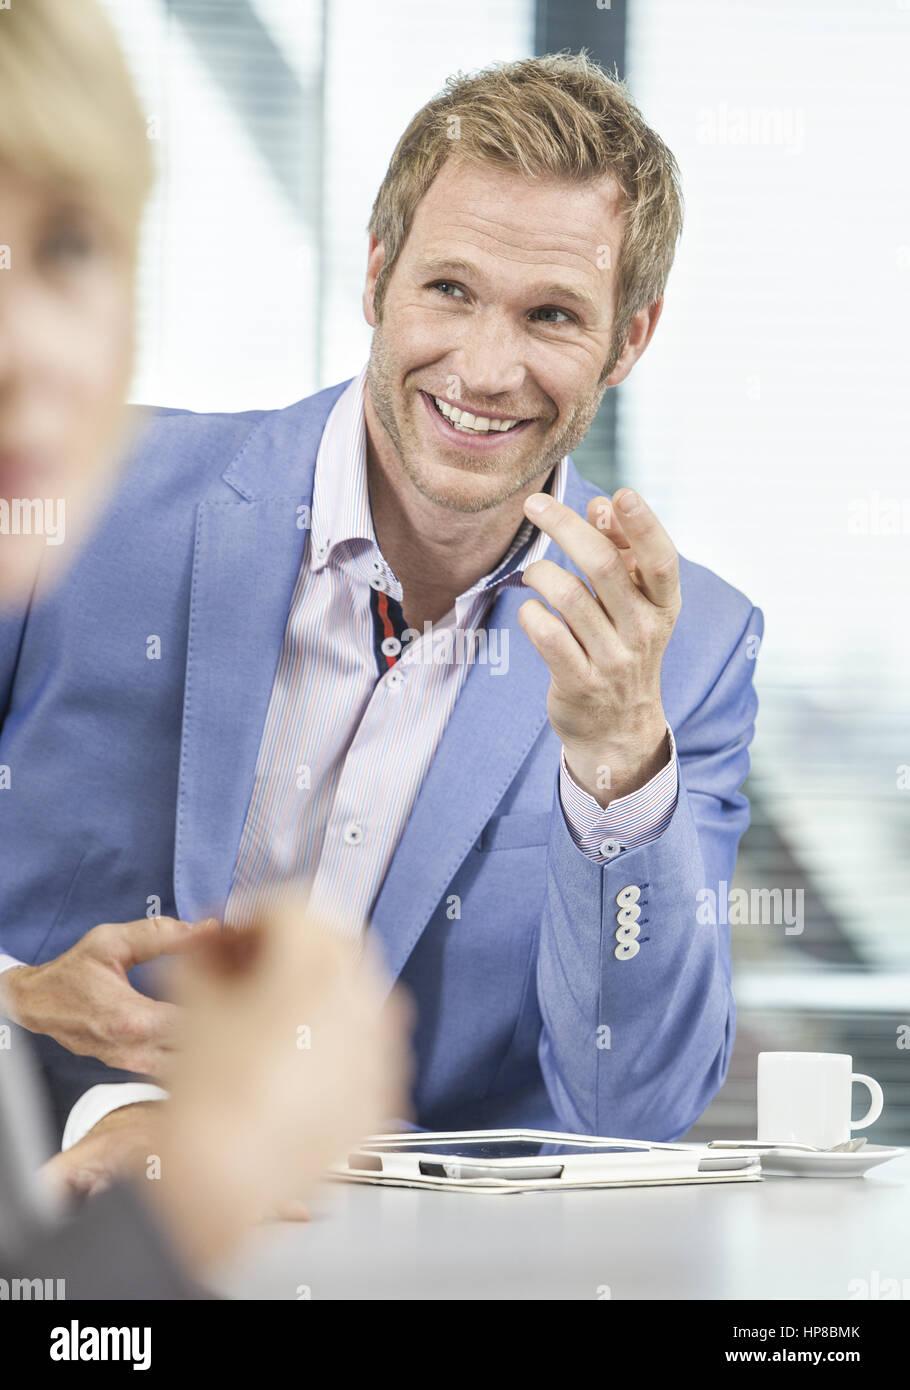 Blonder Mann im Gespraech (model-released) - Stock Image